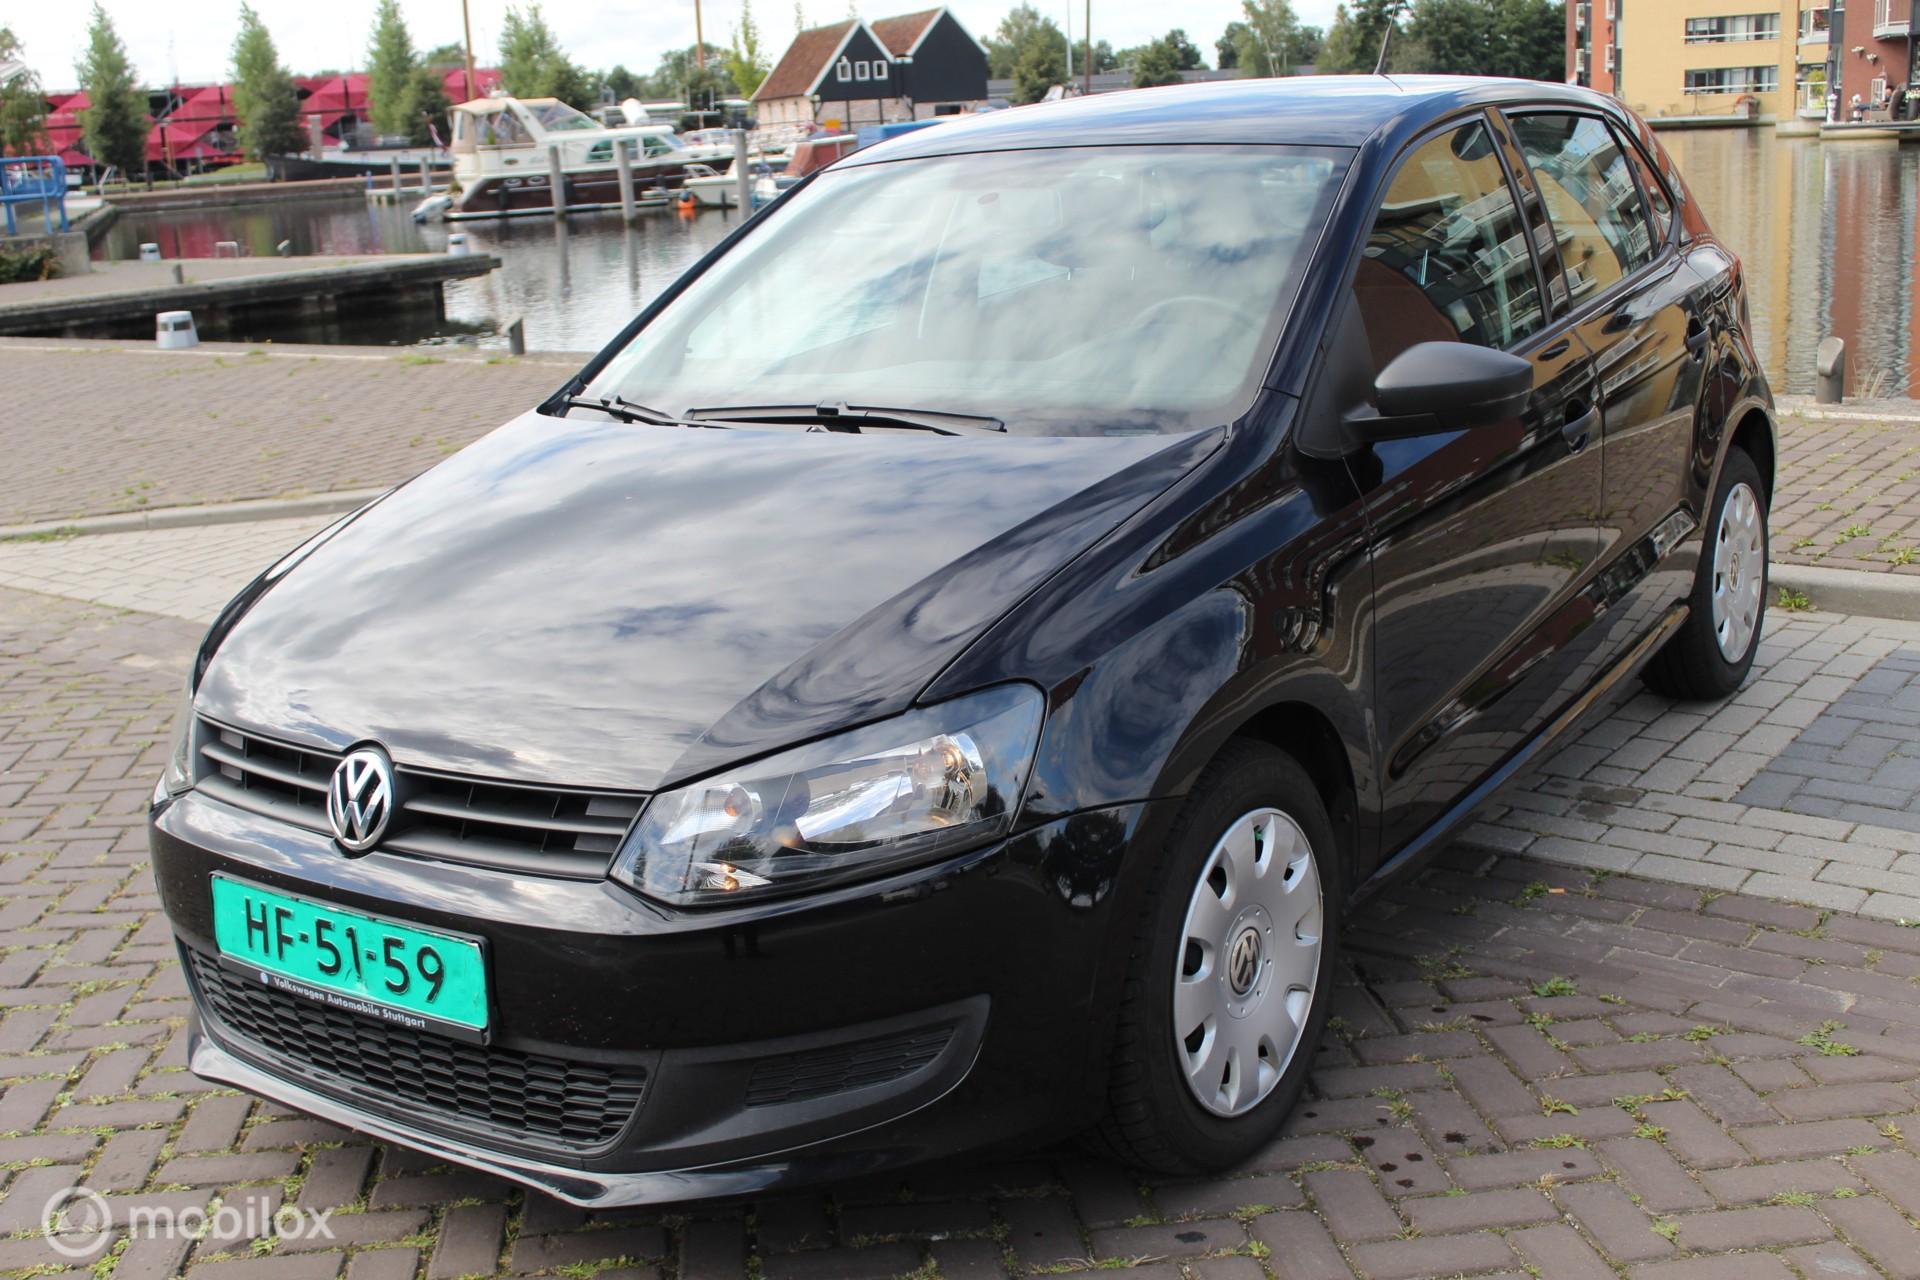 Volkswagen Polo 1.2 Nieuwst 5-deurs 4x elektr ramen. Airco!